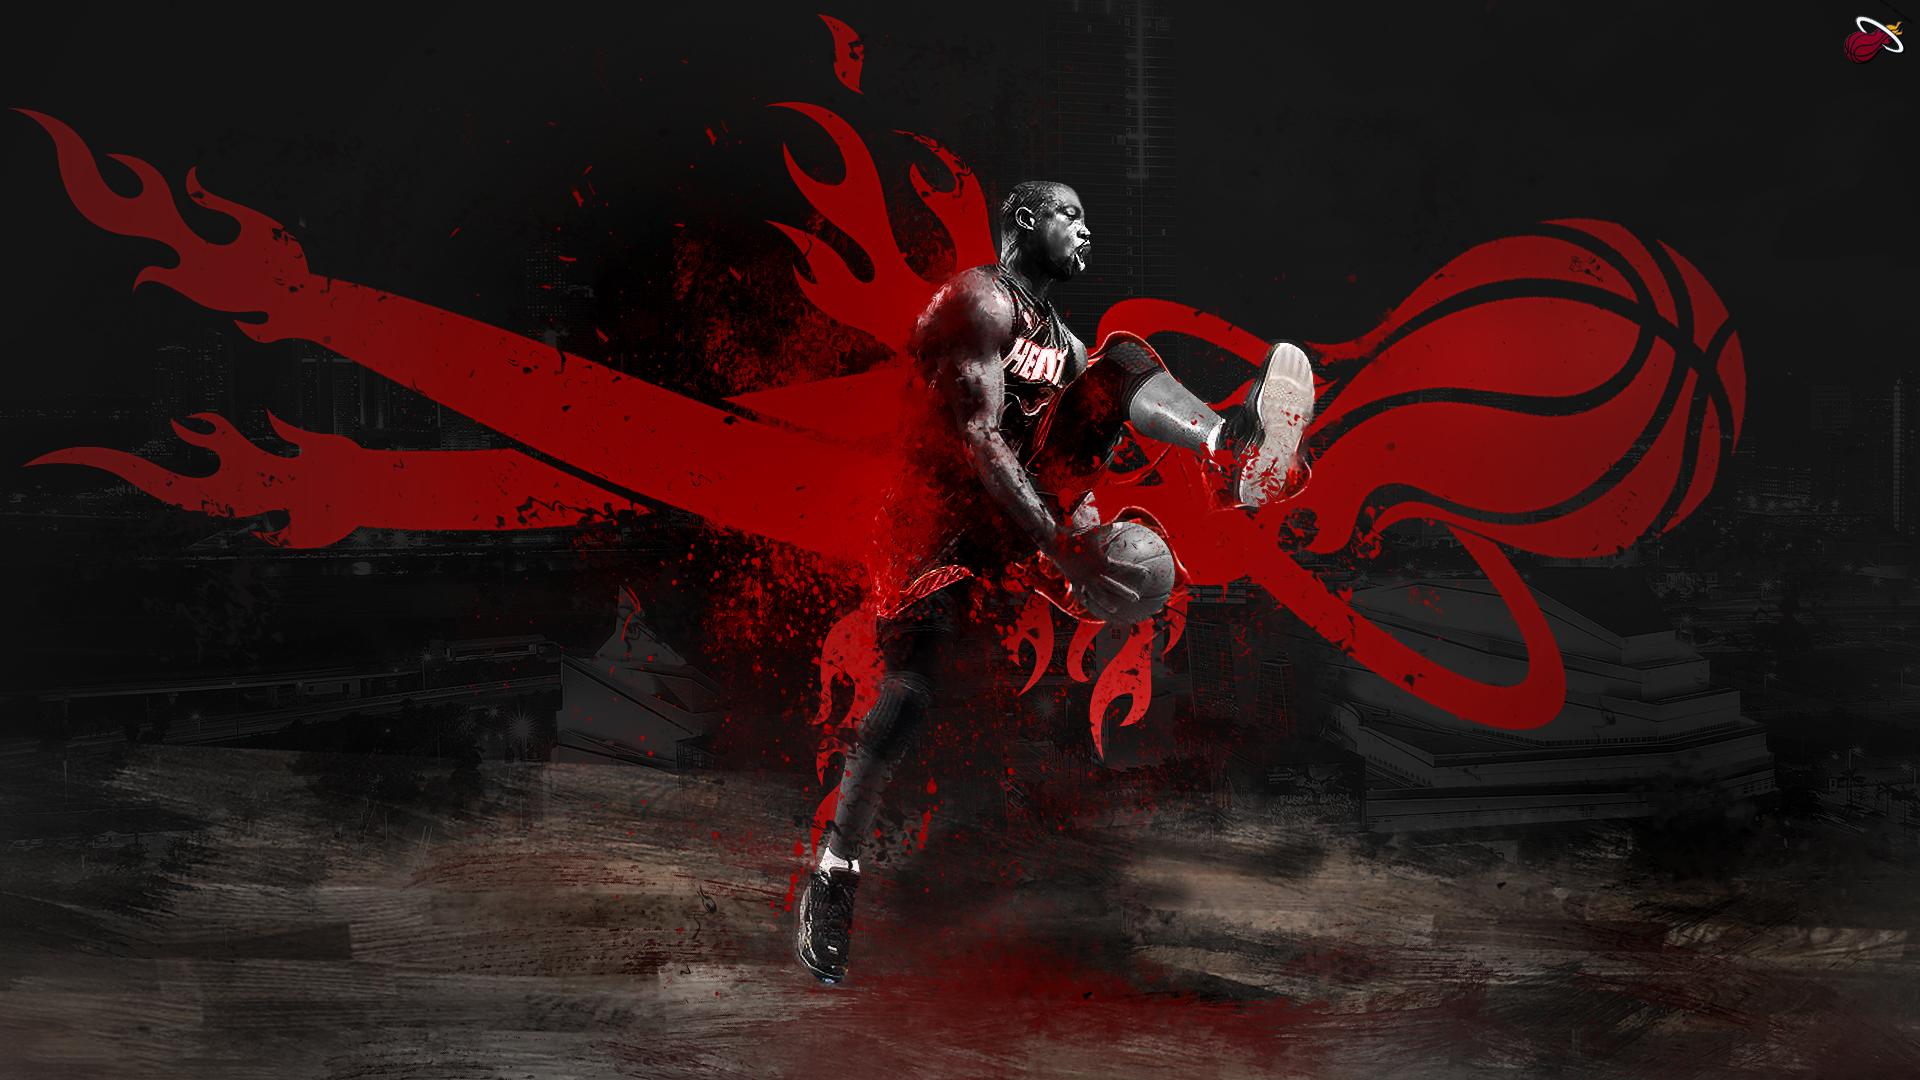 Dwyane Wade 2014 Miami Heat NBA Wallpaper 1920x1080